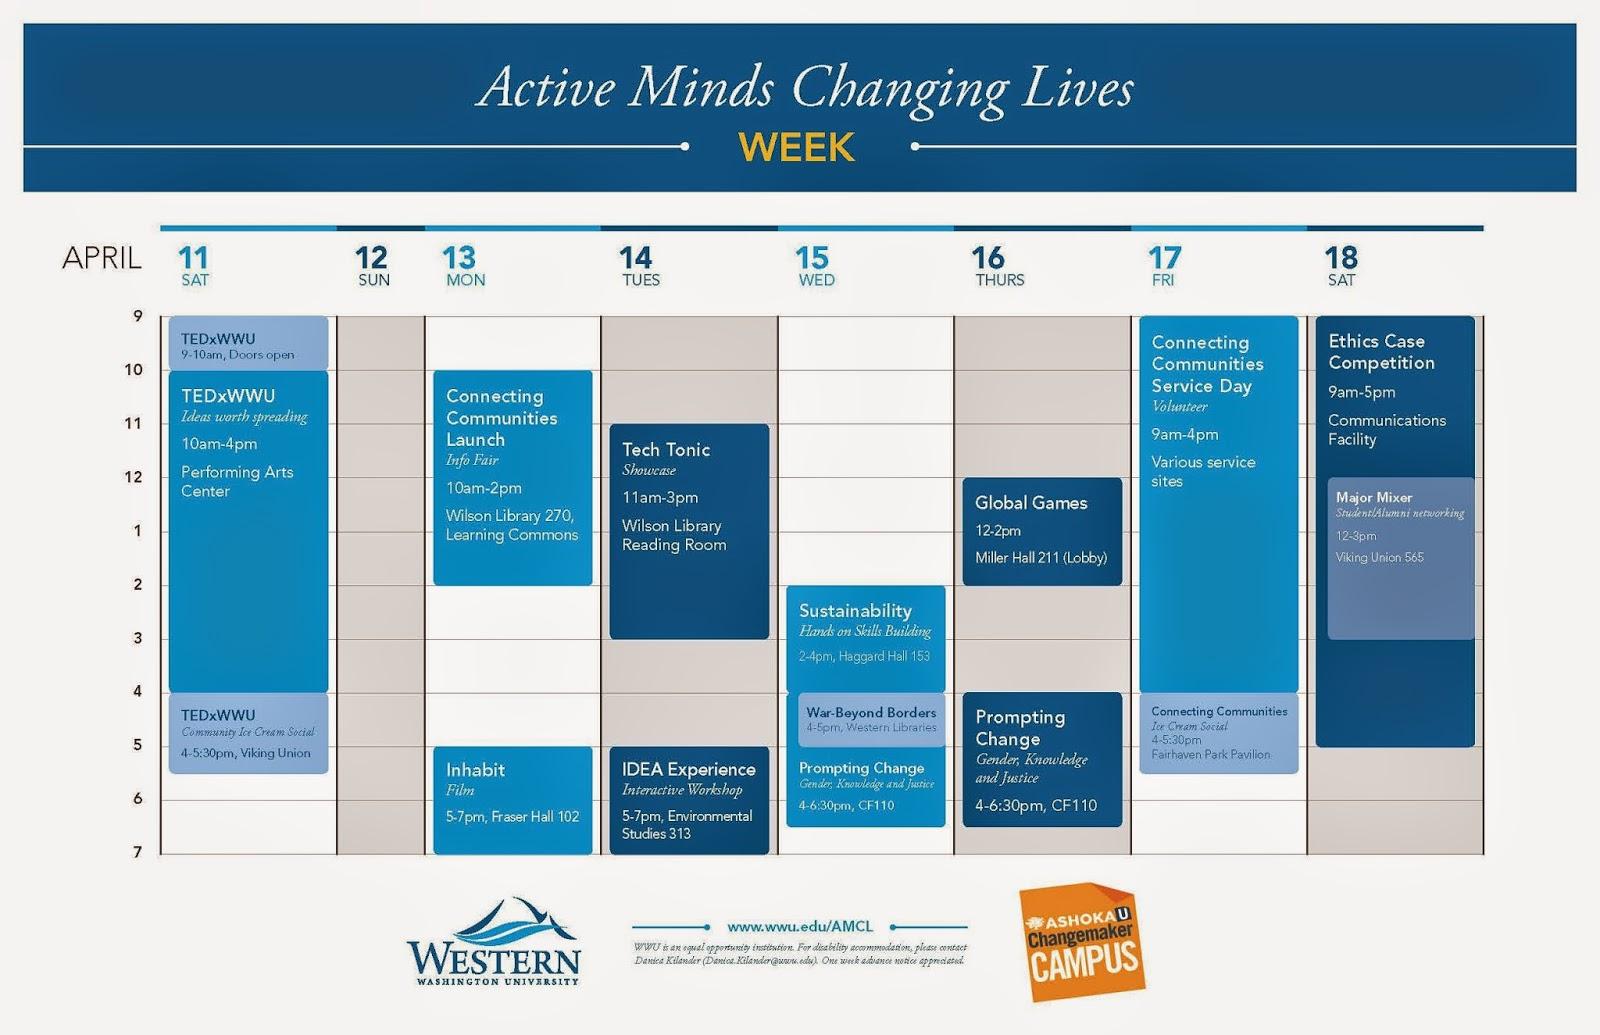 Active Minds Changing Lives Week @WWU